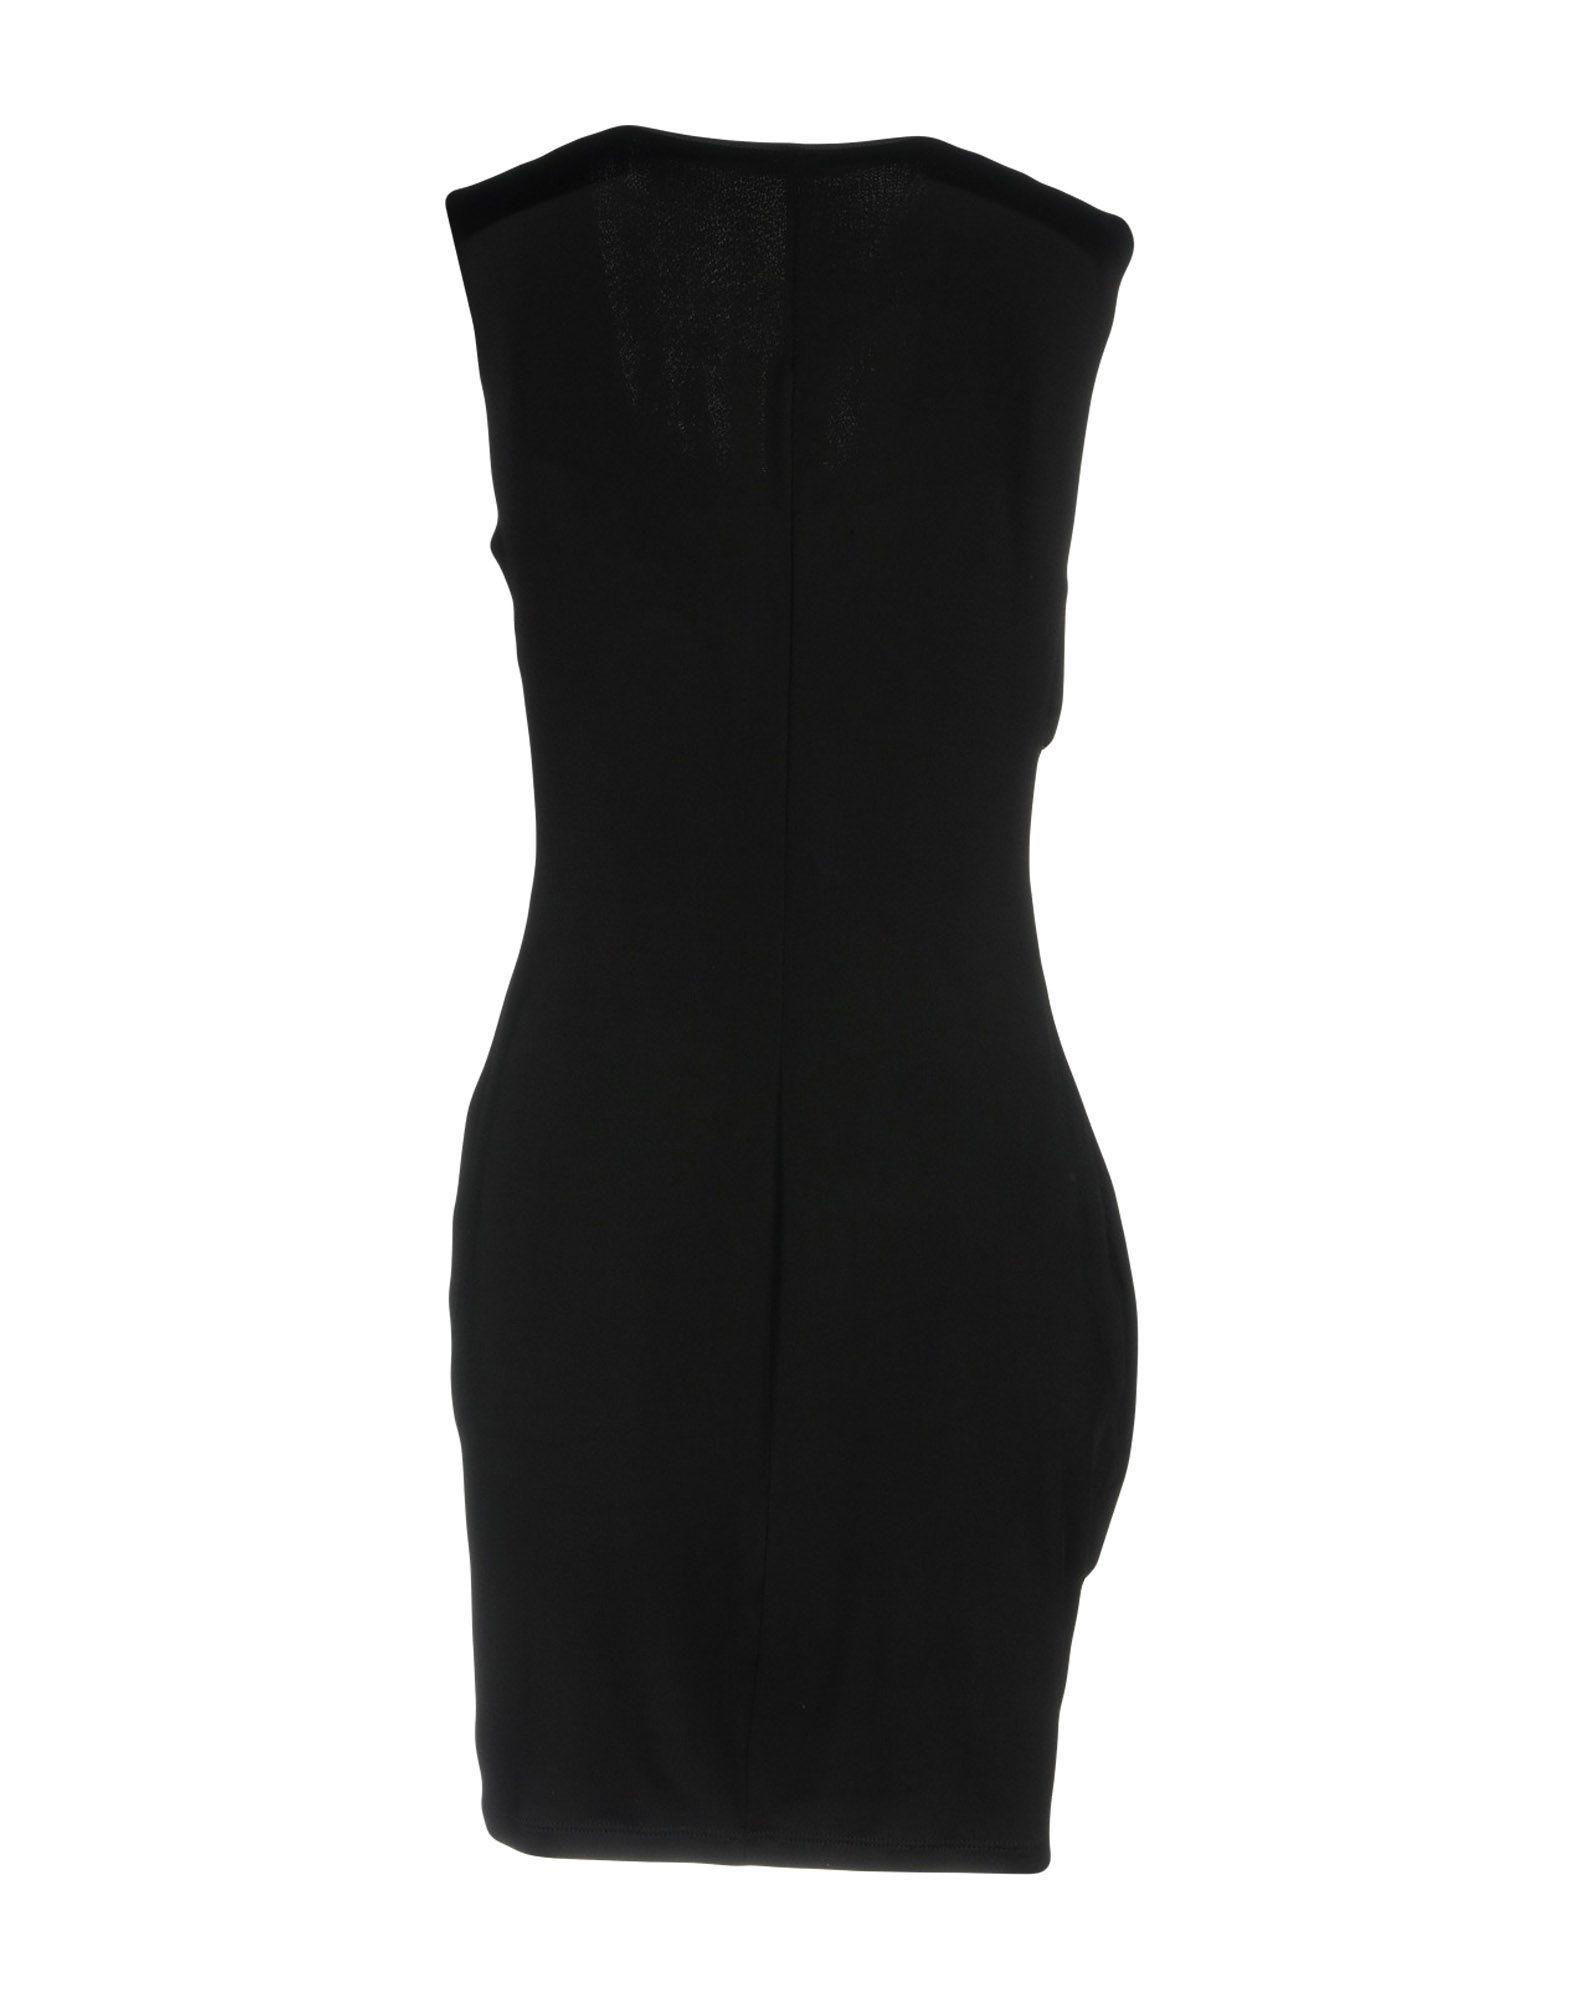 Versace Jeans Black Dress